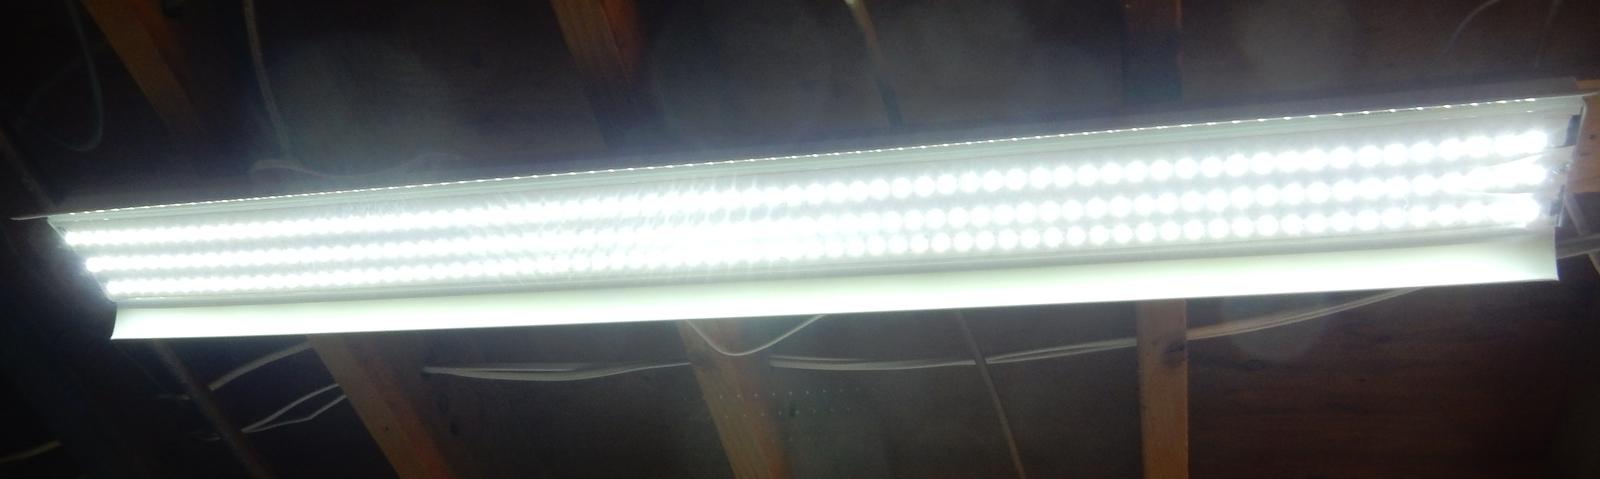 Kit: 100W Power Supply+ 1x 16' LED Strip, Bright White, Hi-Lumen, Pro-grade